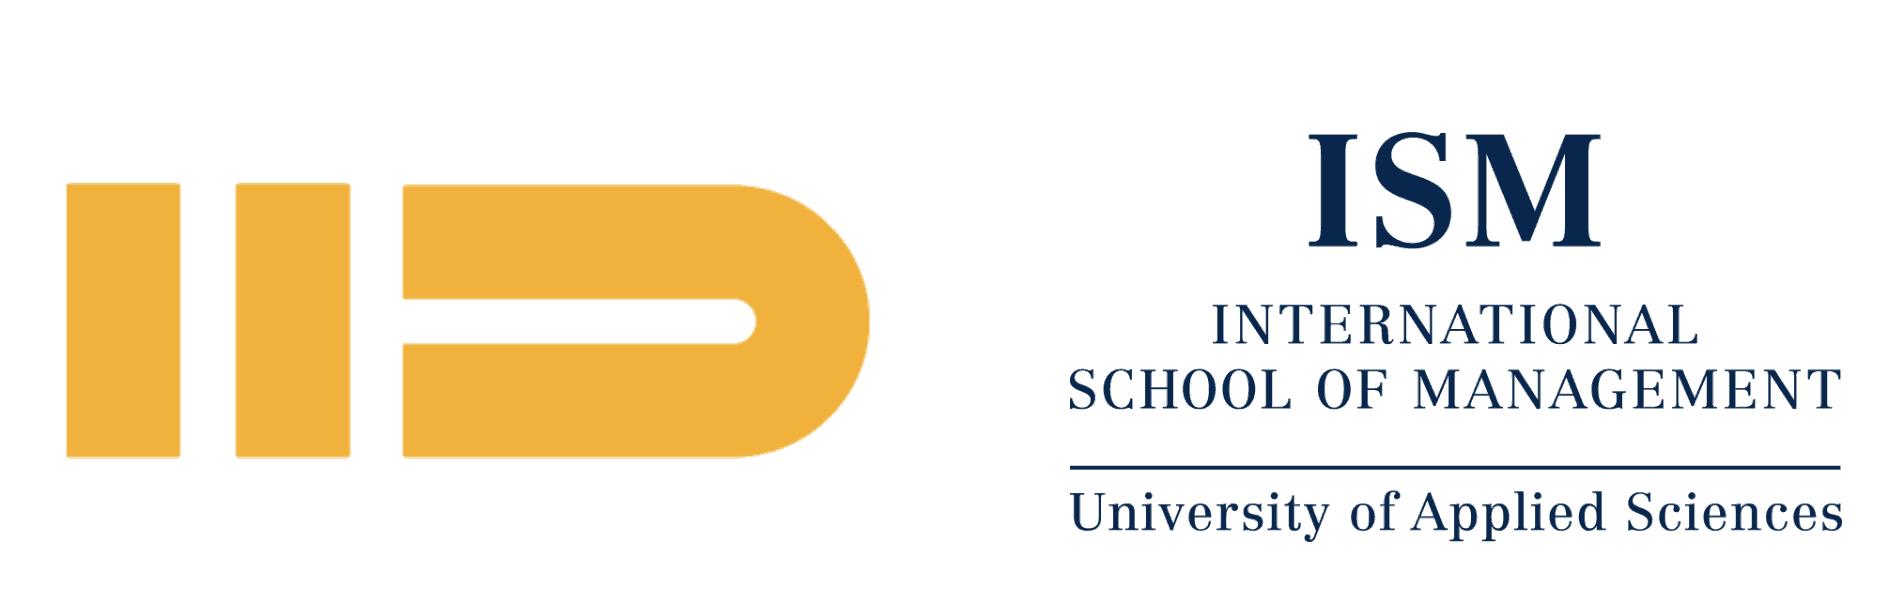 Hospitality Digital meets ISM International School of Management